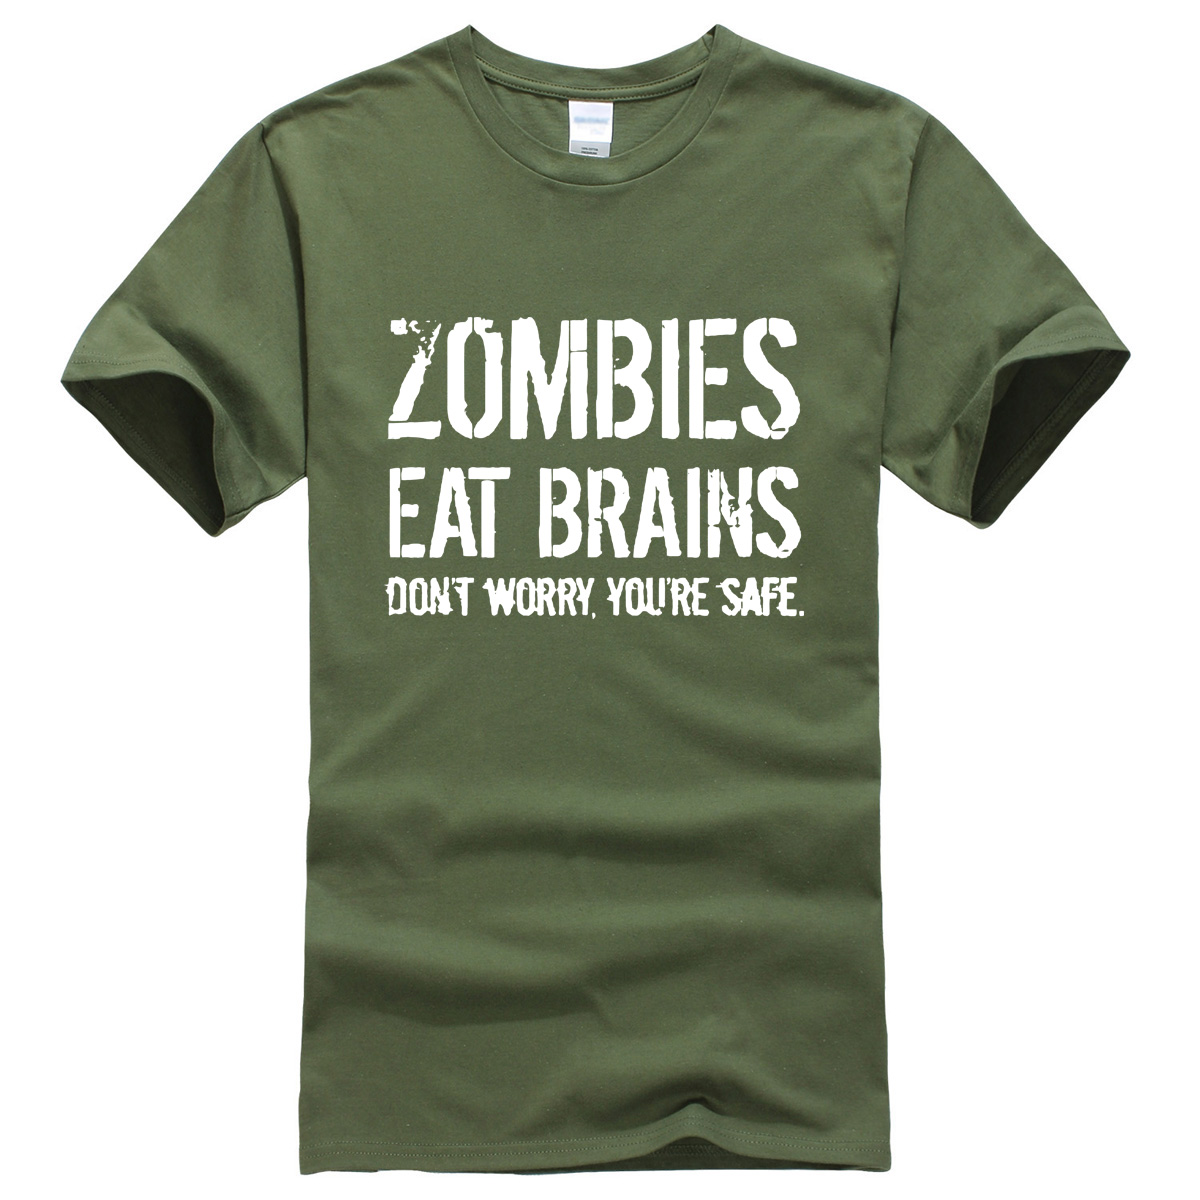 Men's T-shirts Zombies Eat Brains printed 2017 summer casual funny brand-clothing t shirt for men sportwear T-shirt harajuku top